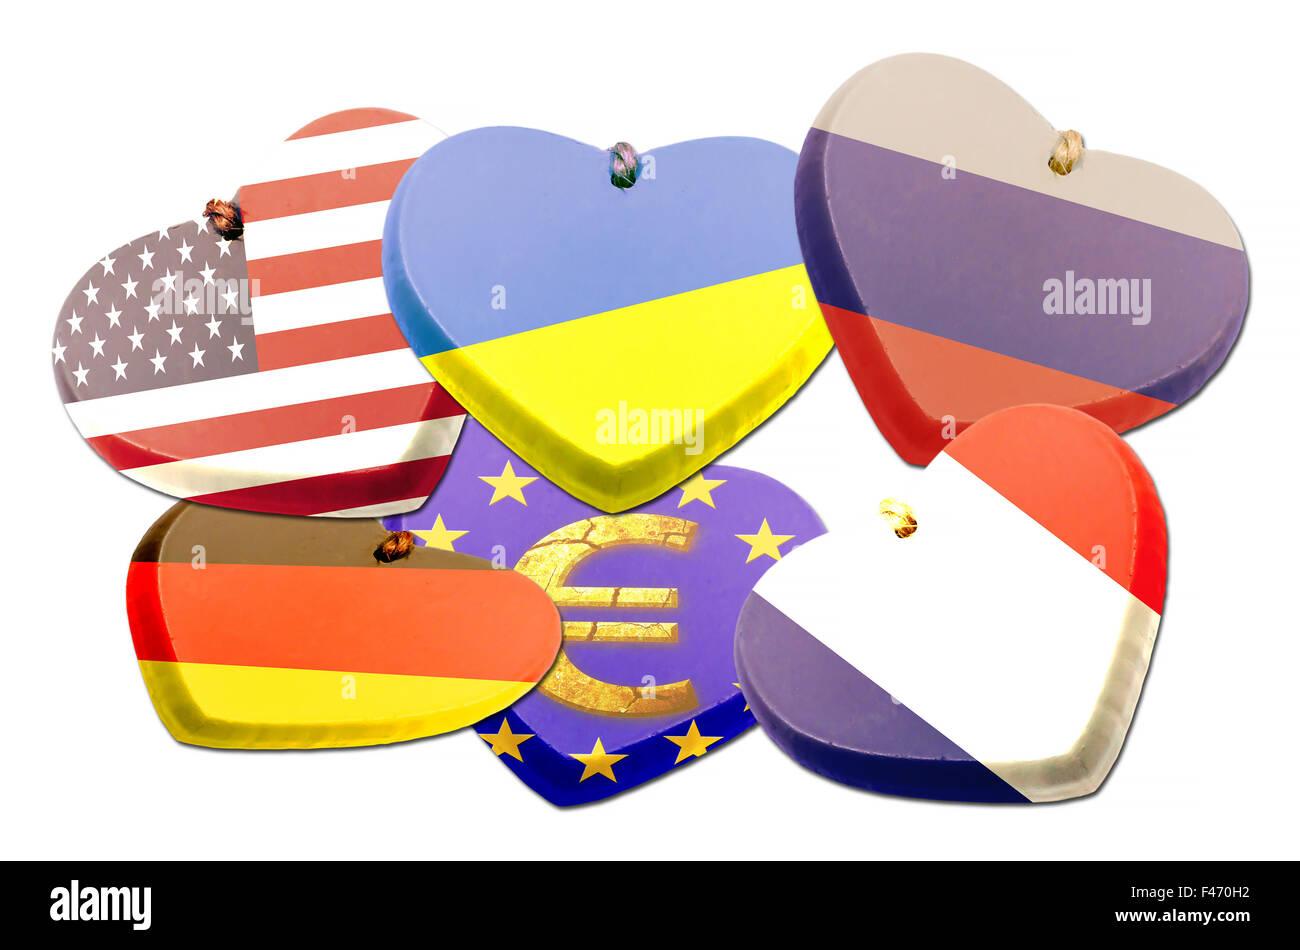 Flags heart - Patriotism - Illustration - Stock Image